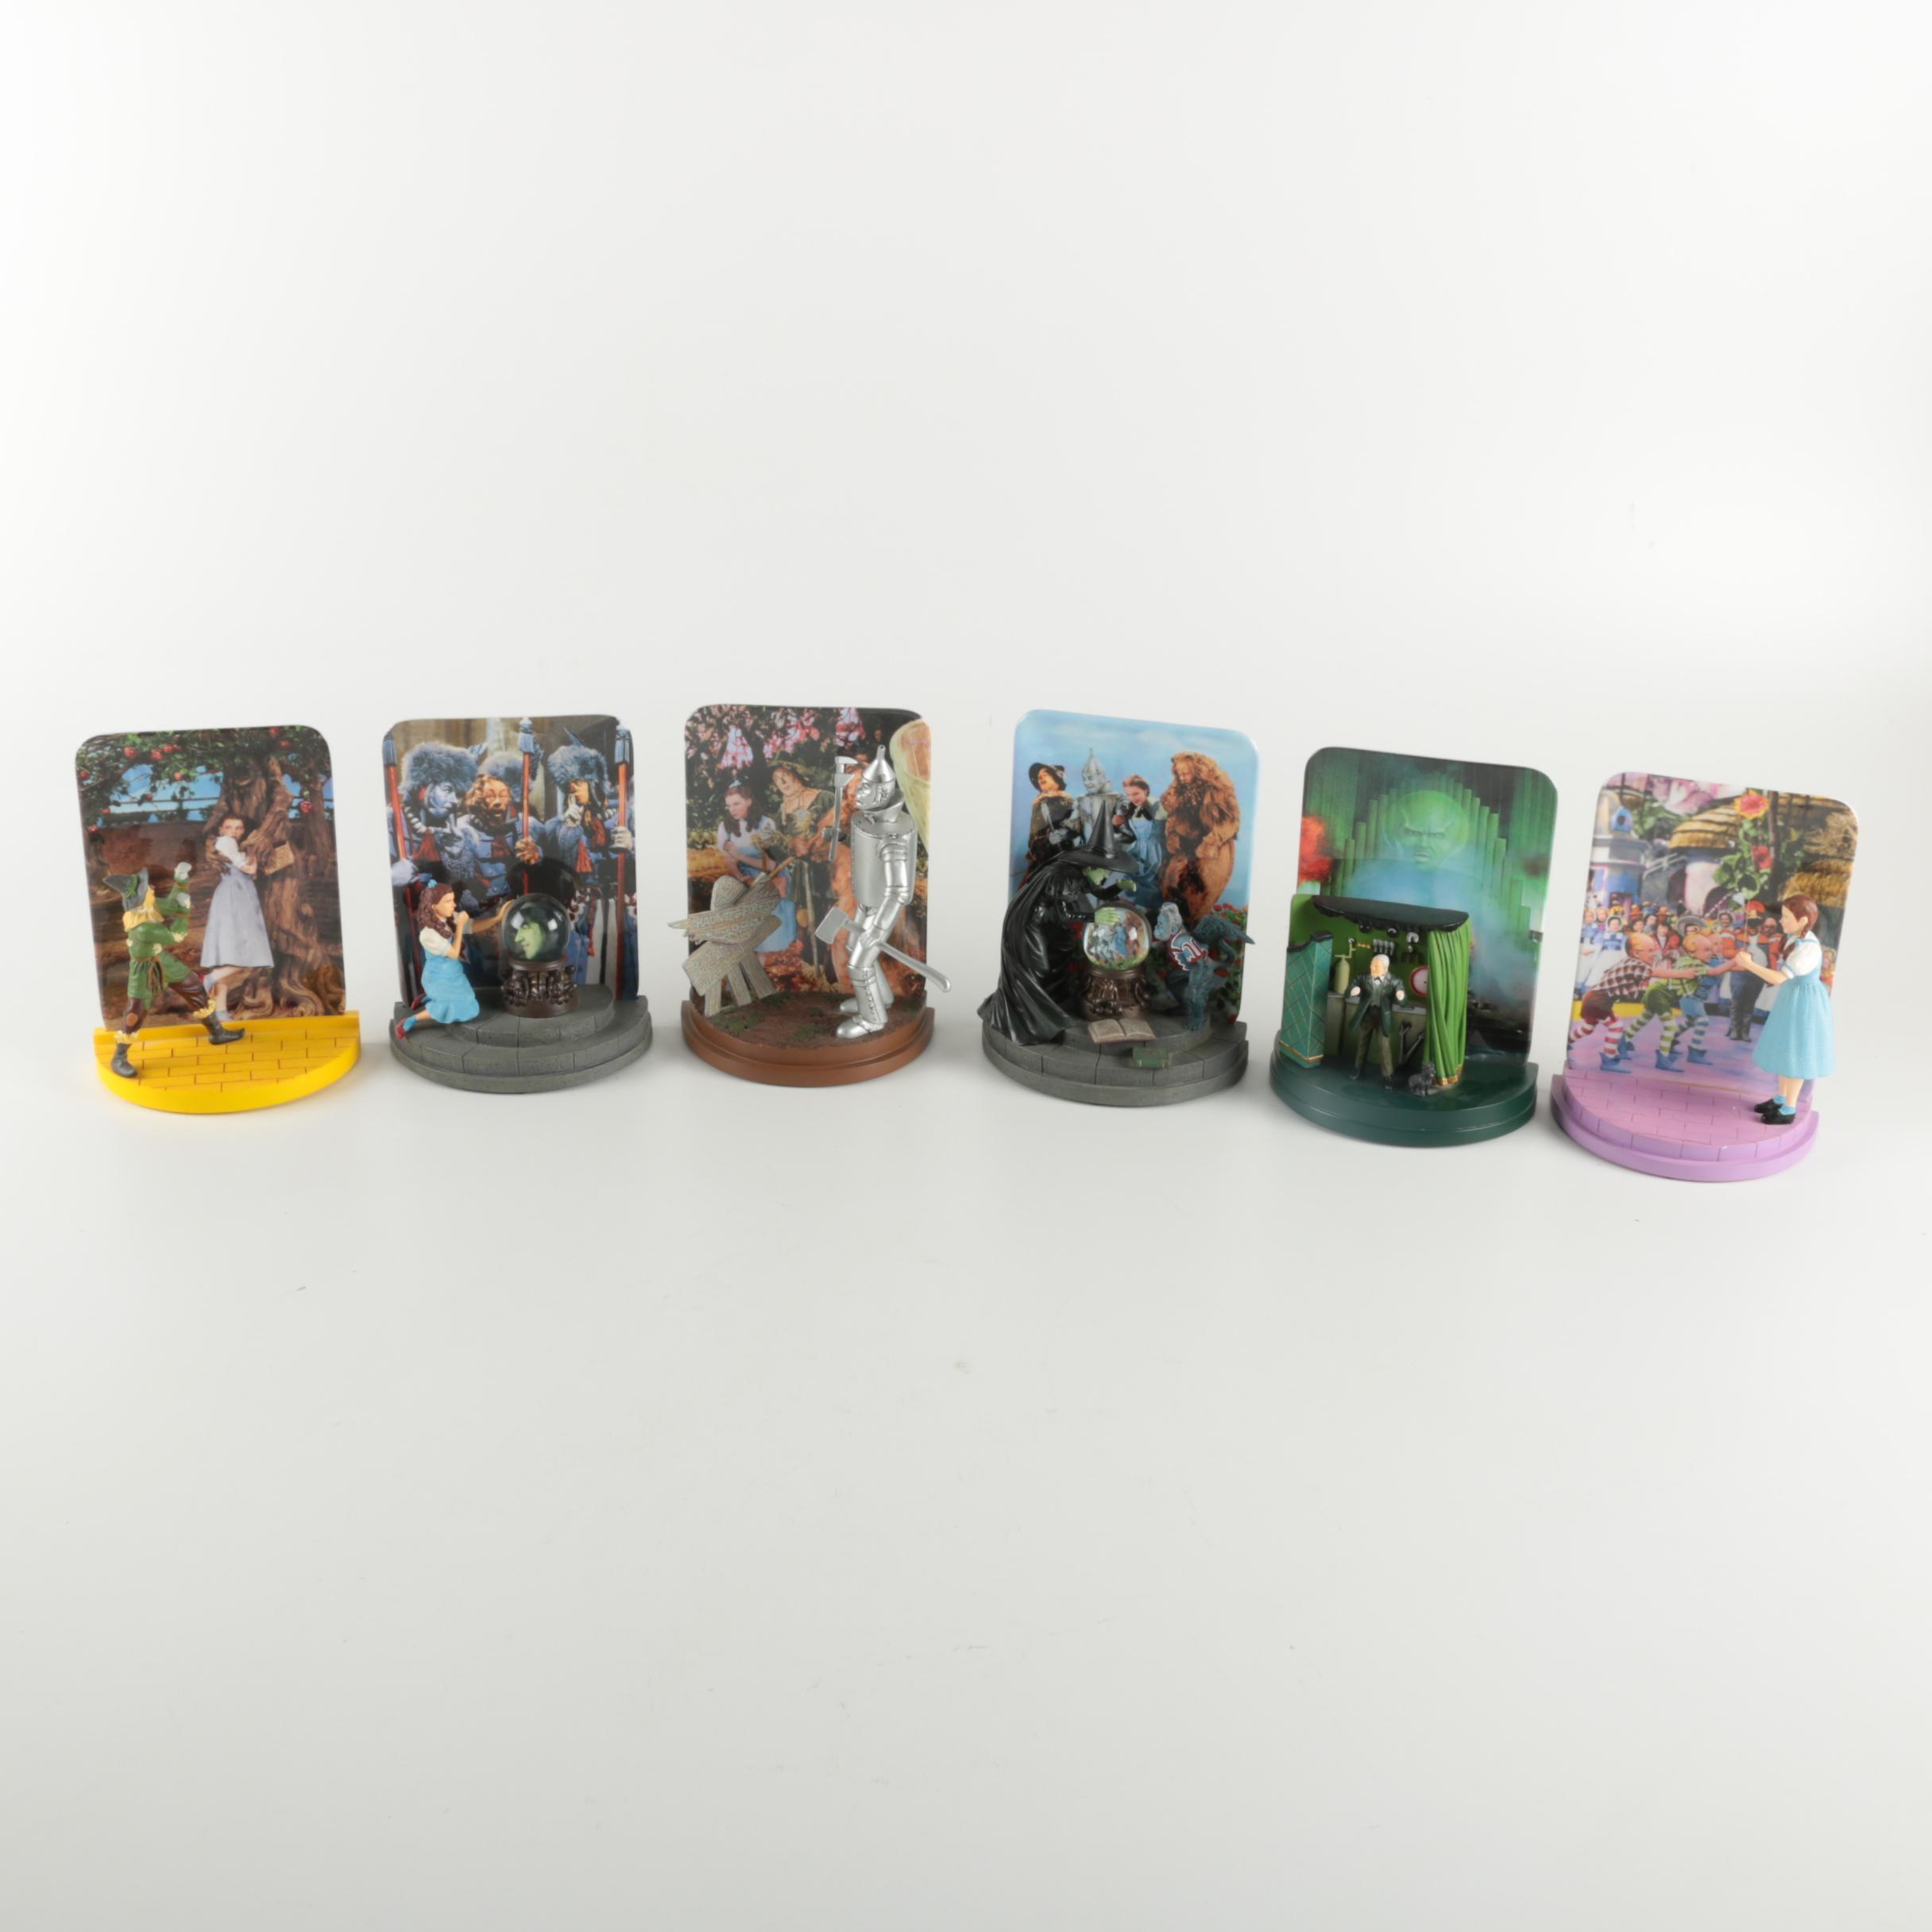 Bradford Exchange Limited Edition Wizard of Oz Decorative Plates